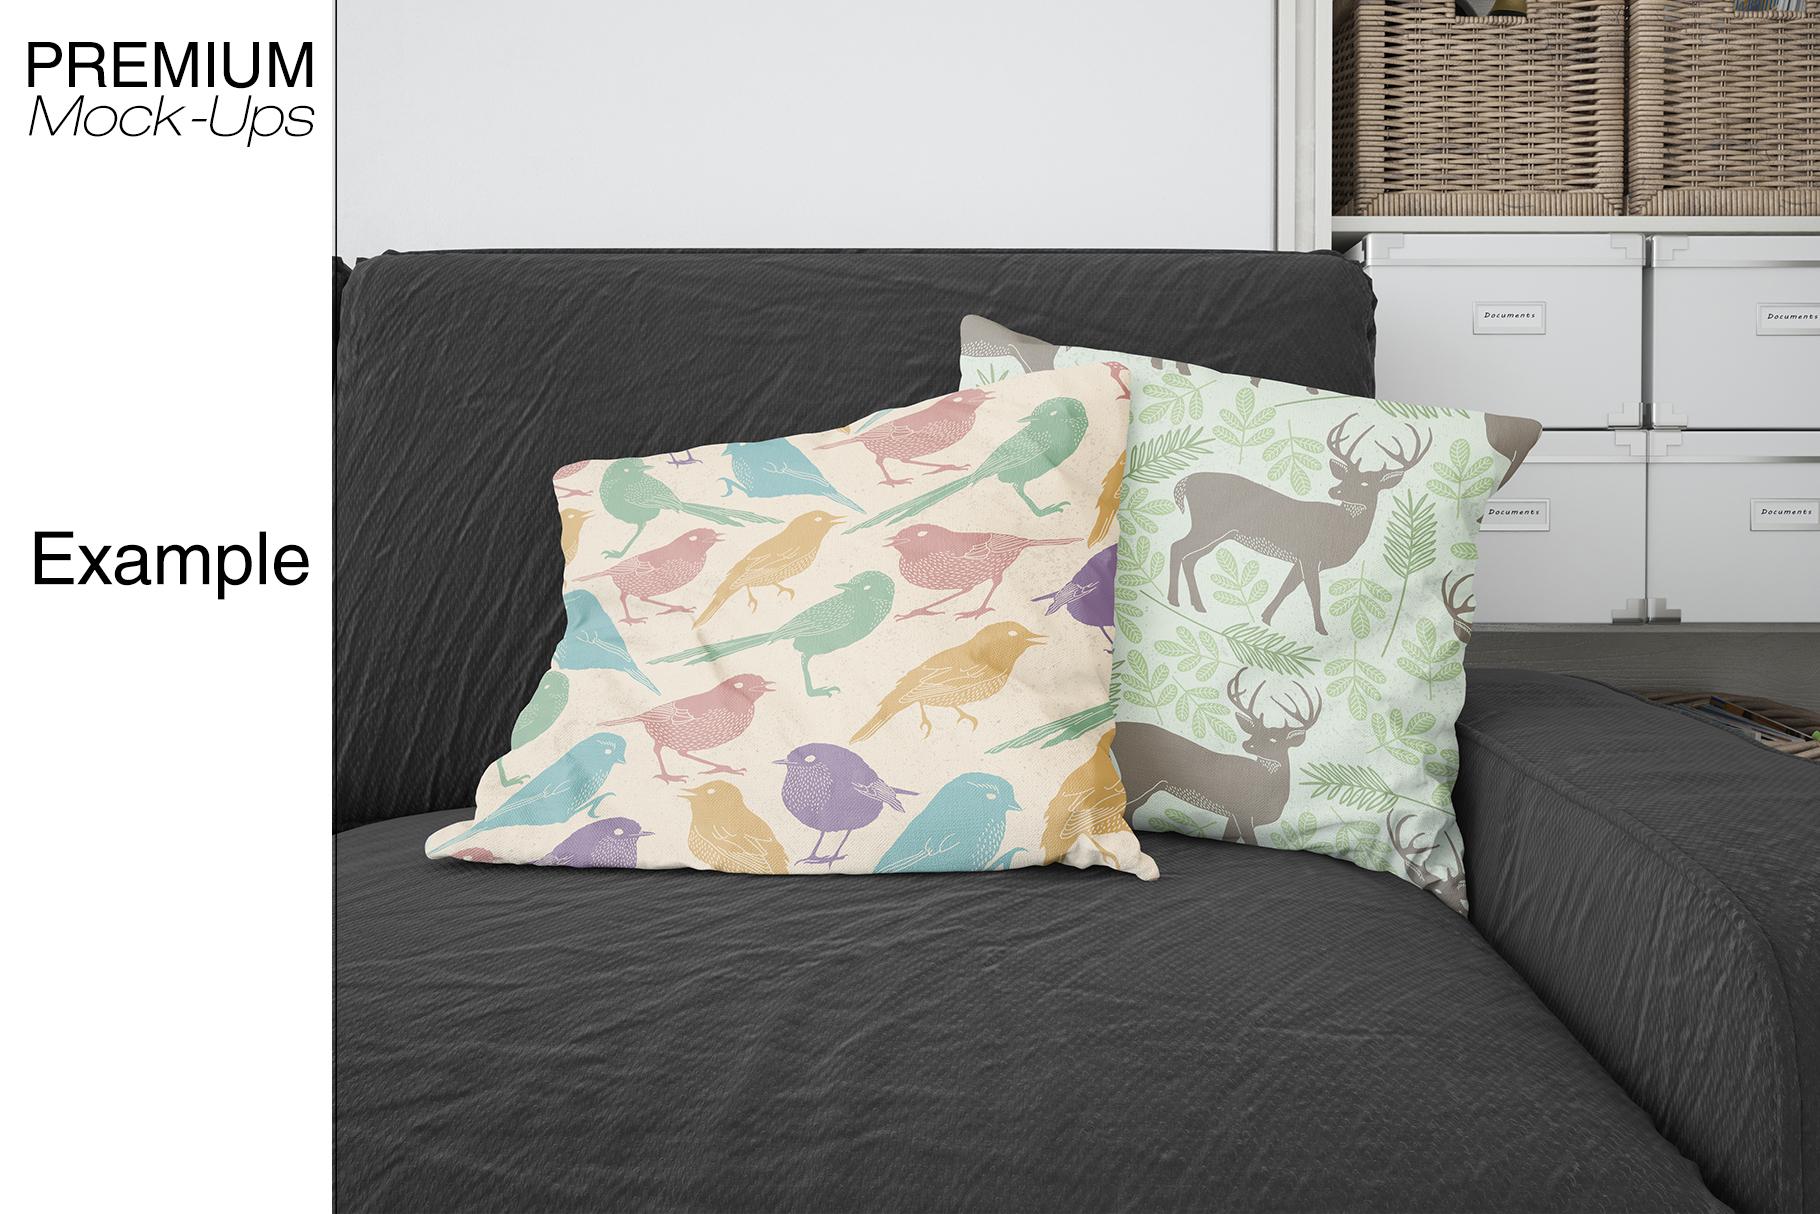 Pillows & Frames Mockup Set example image 18